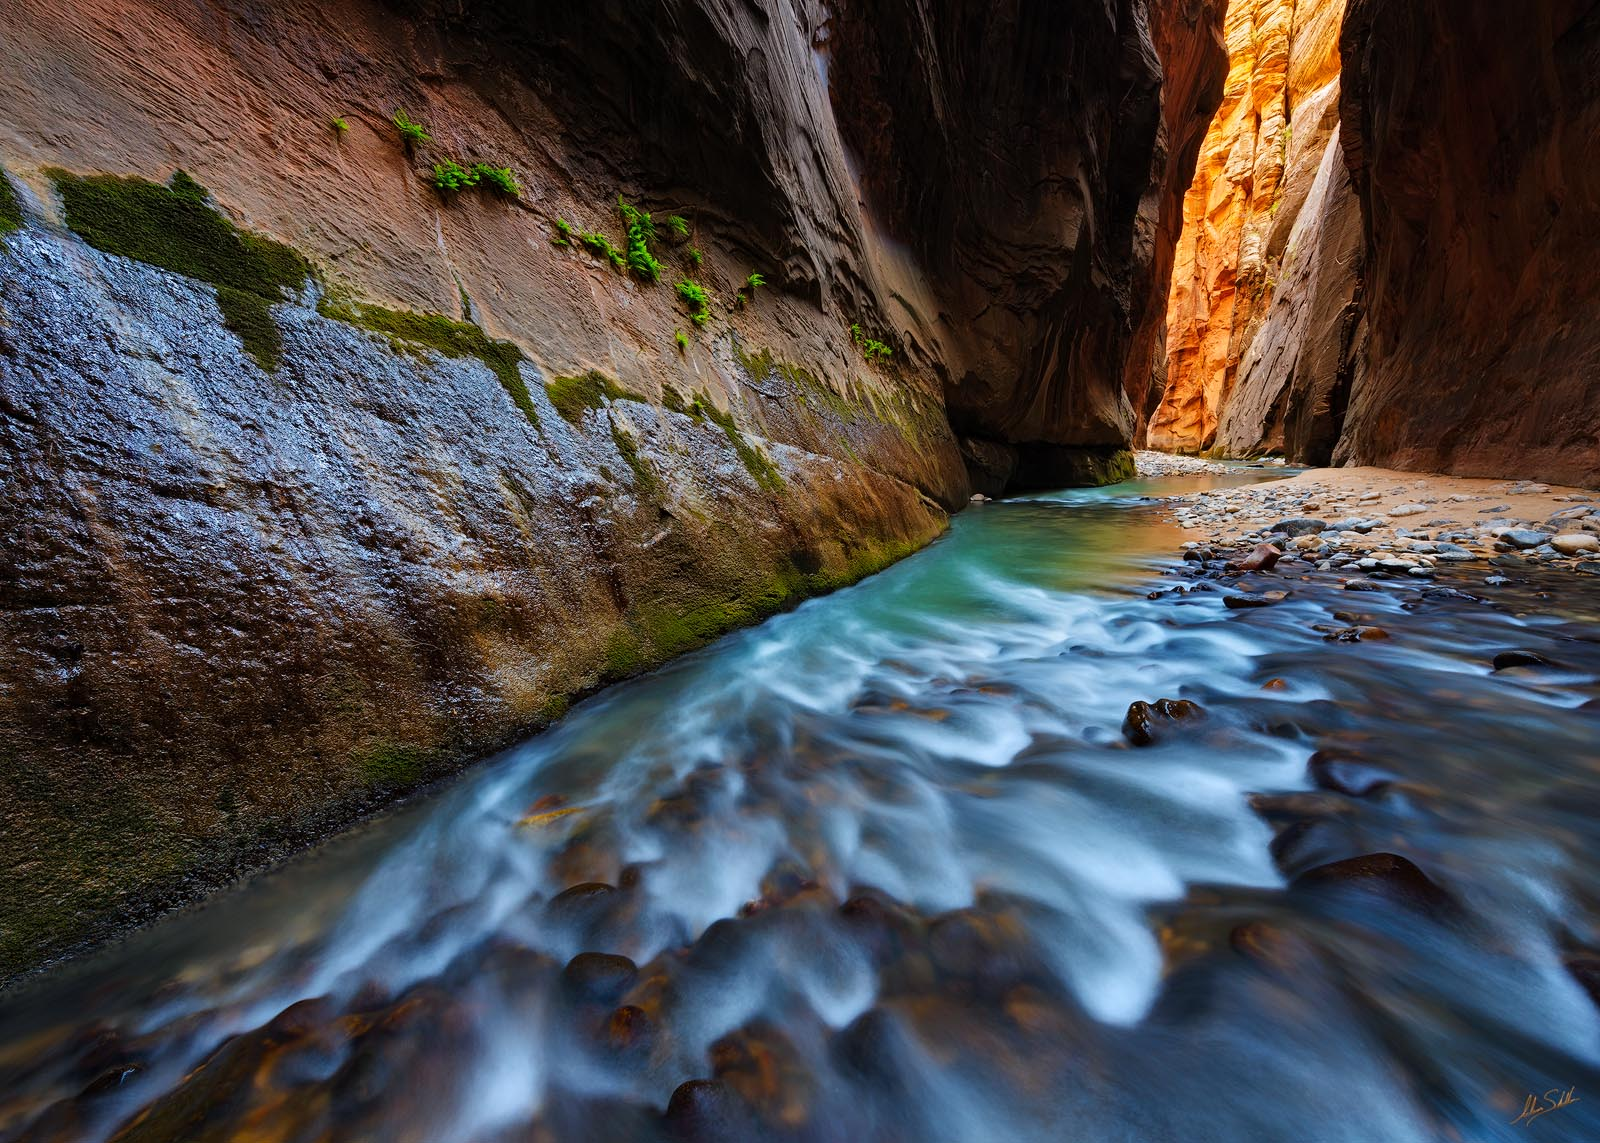 River, Utah, Virgin River, Virgin River Narrows, Water, Zion, Zion National Park, narrows, photo